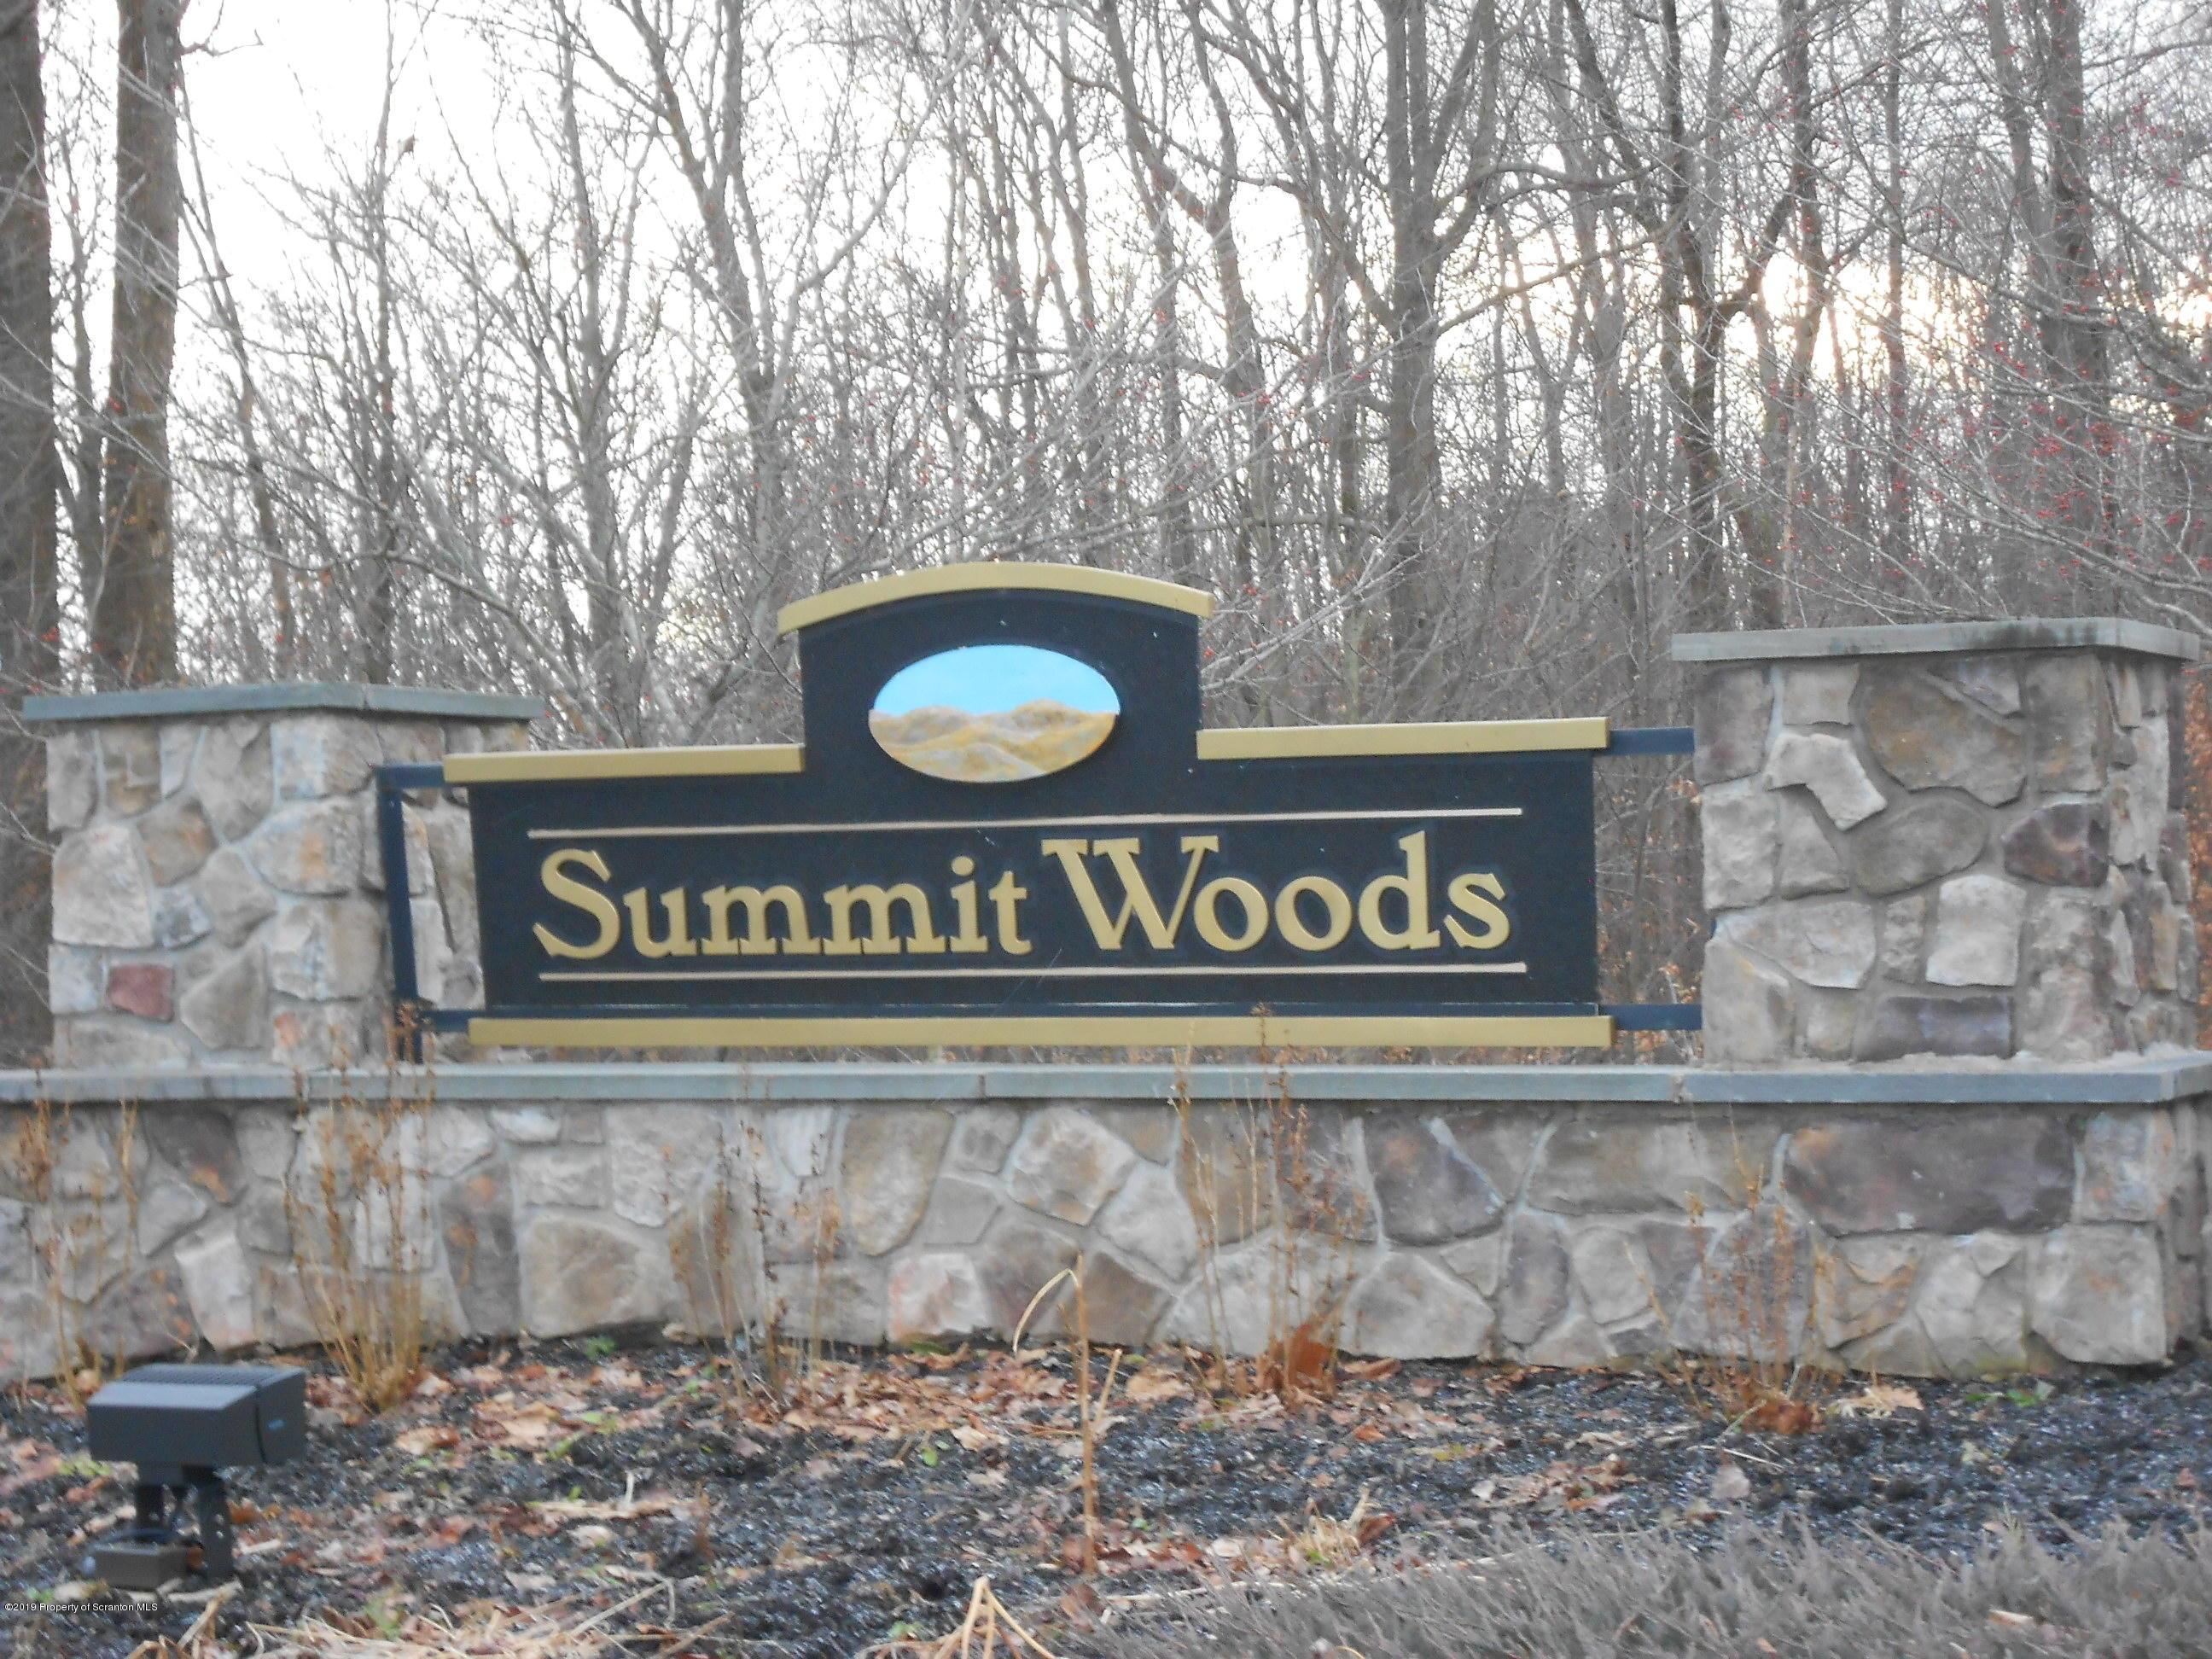 Lot 61 Summit Woods Rd, Roaring Brook Twp, Pennsylvania 18444, ,Land,For Sale,Summit Woods,19-119